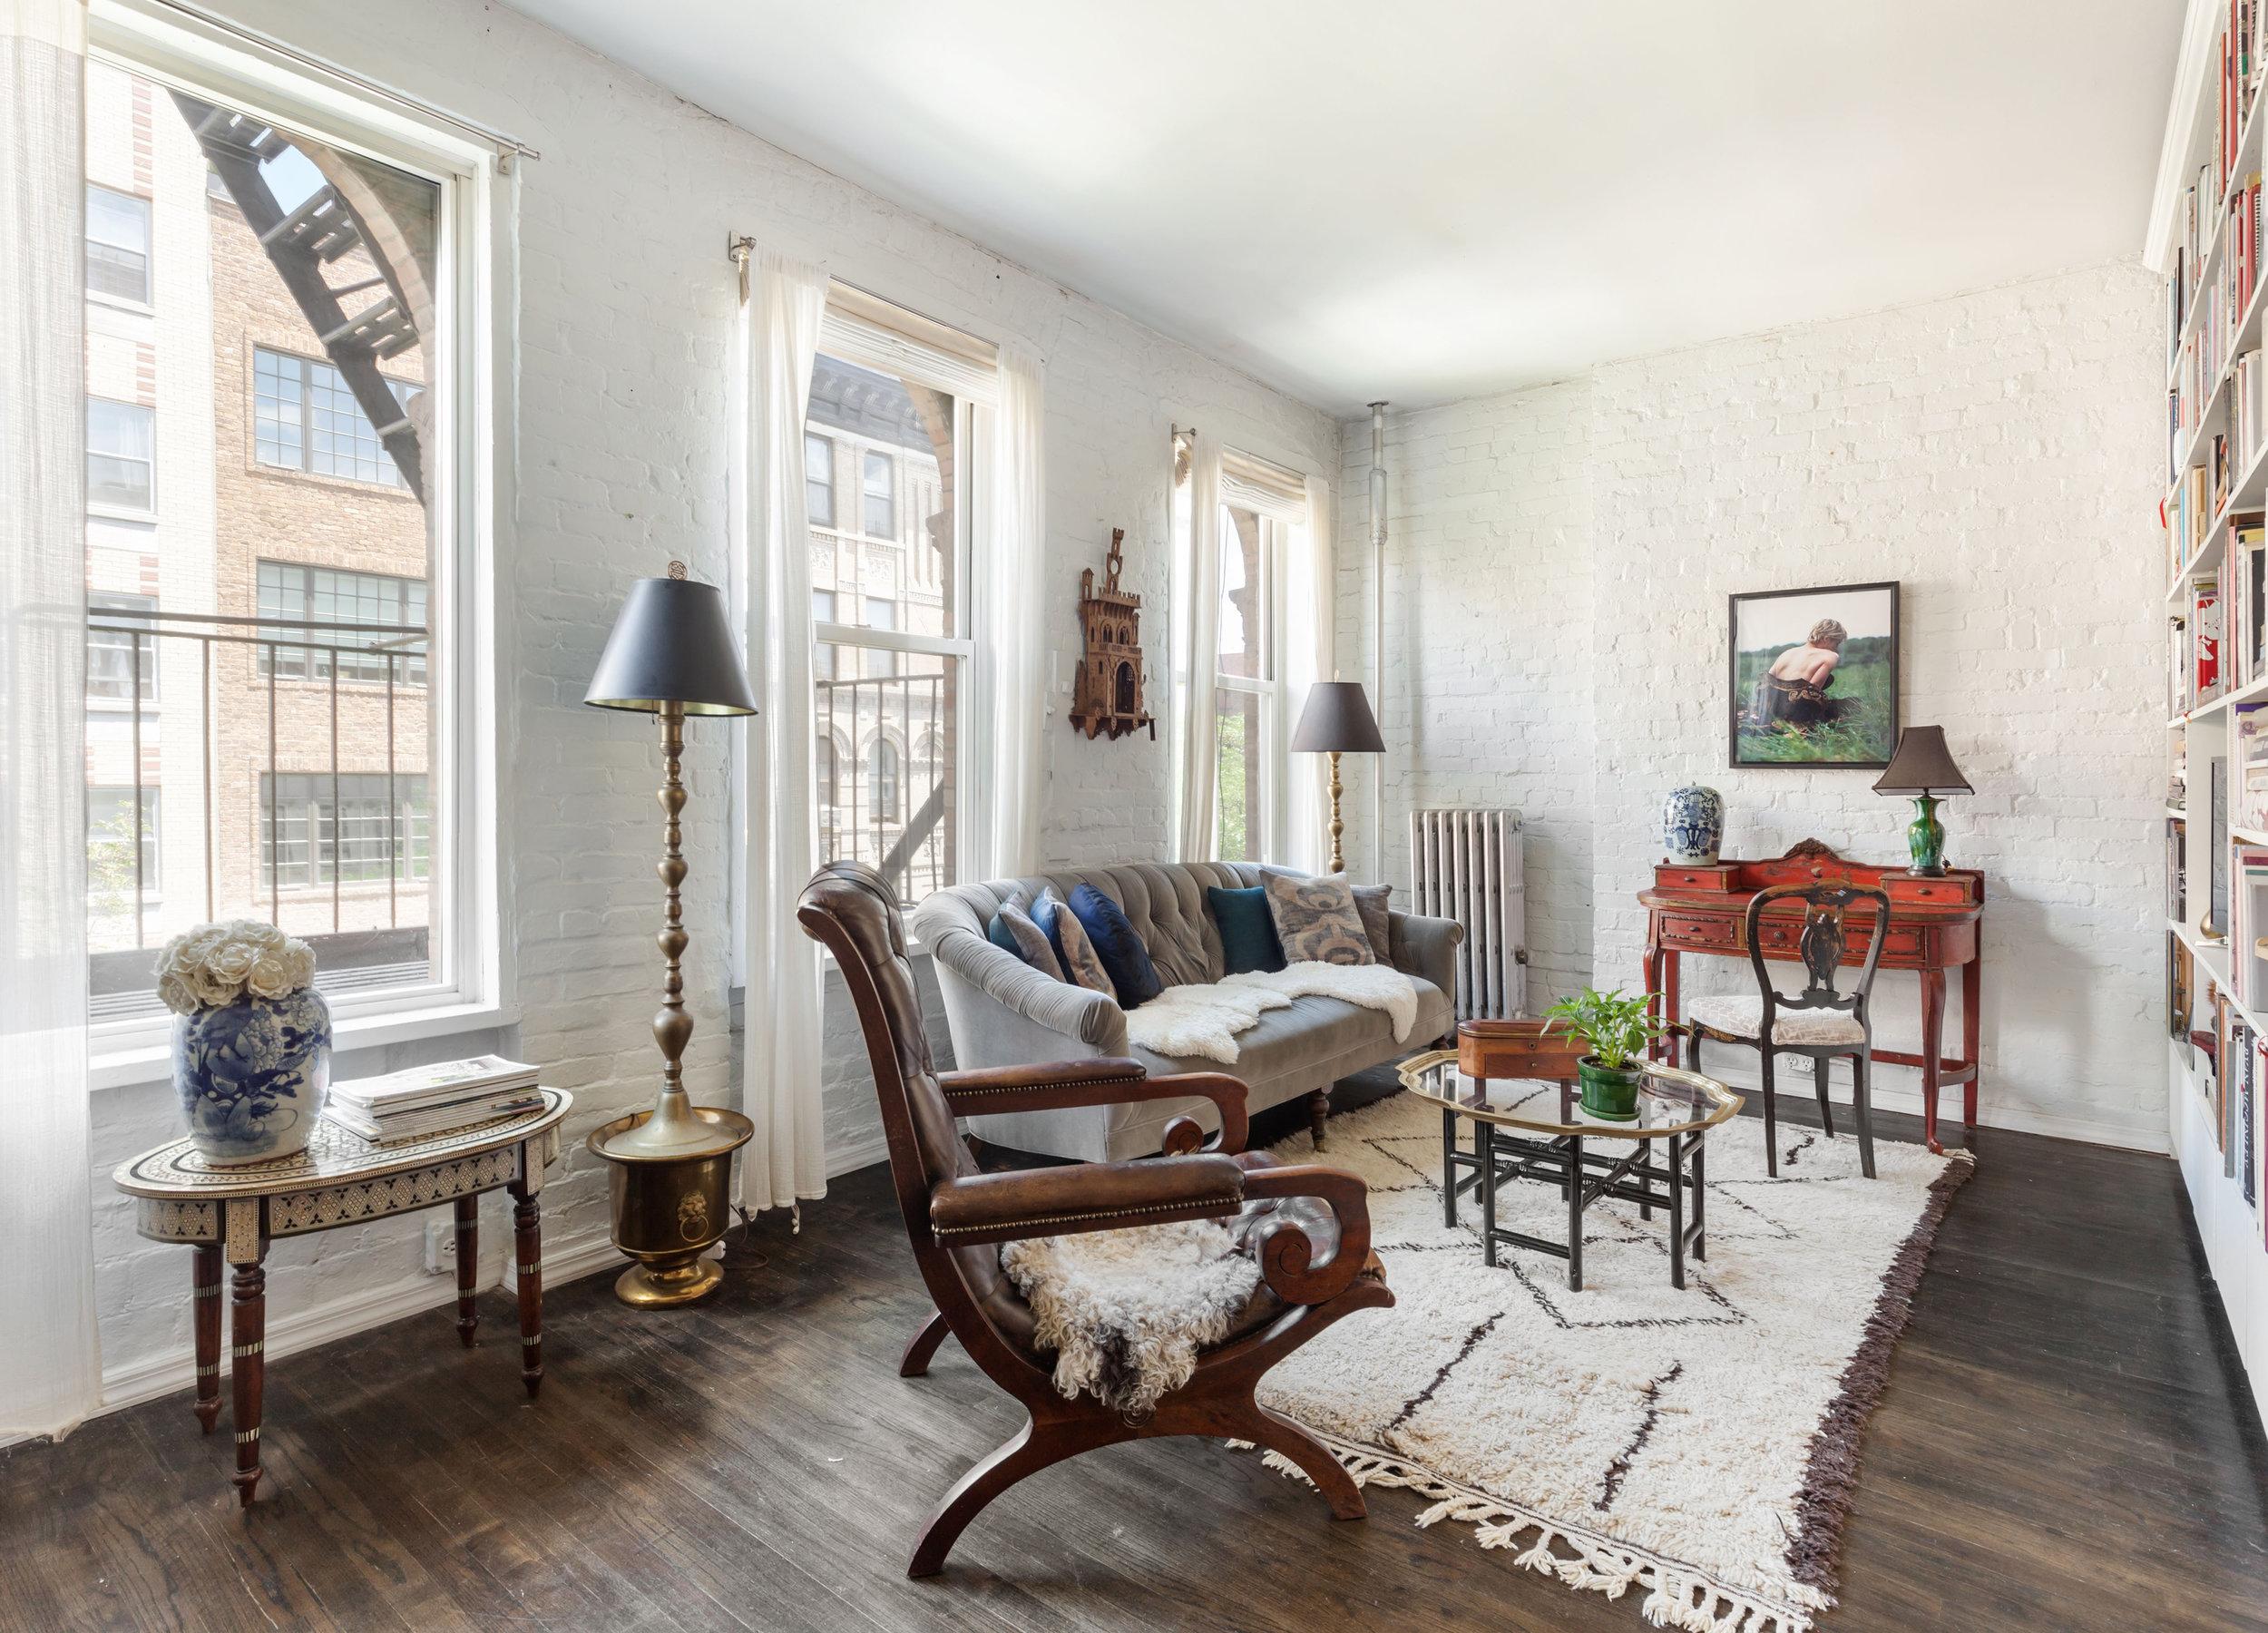 224 East 7th St, Unit 13  East Village, Manhattan   $949,000  2 Beds | 1 Baths | 850 SF